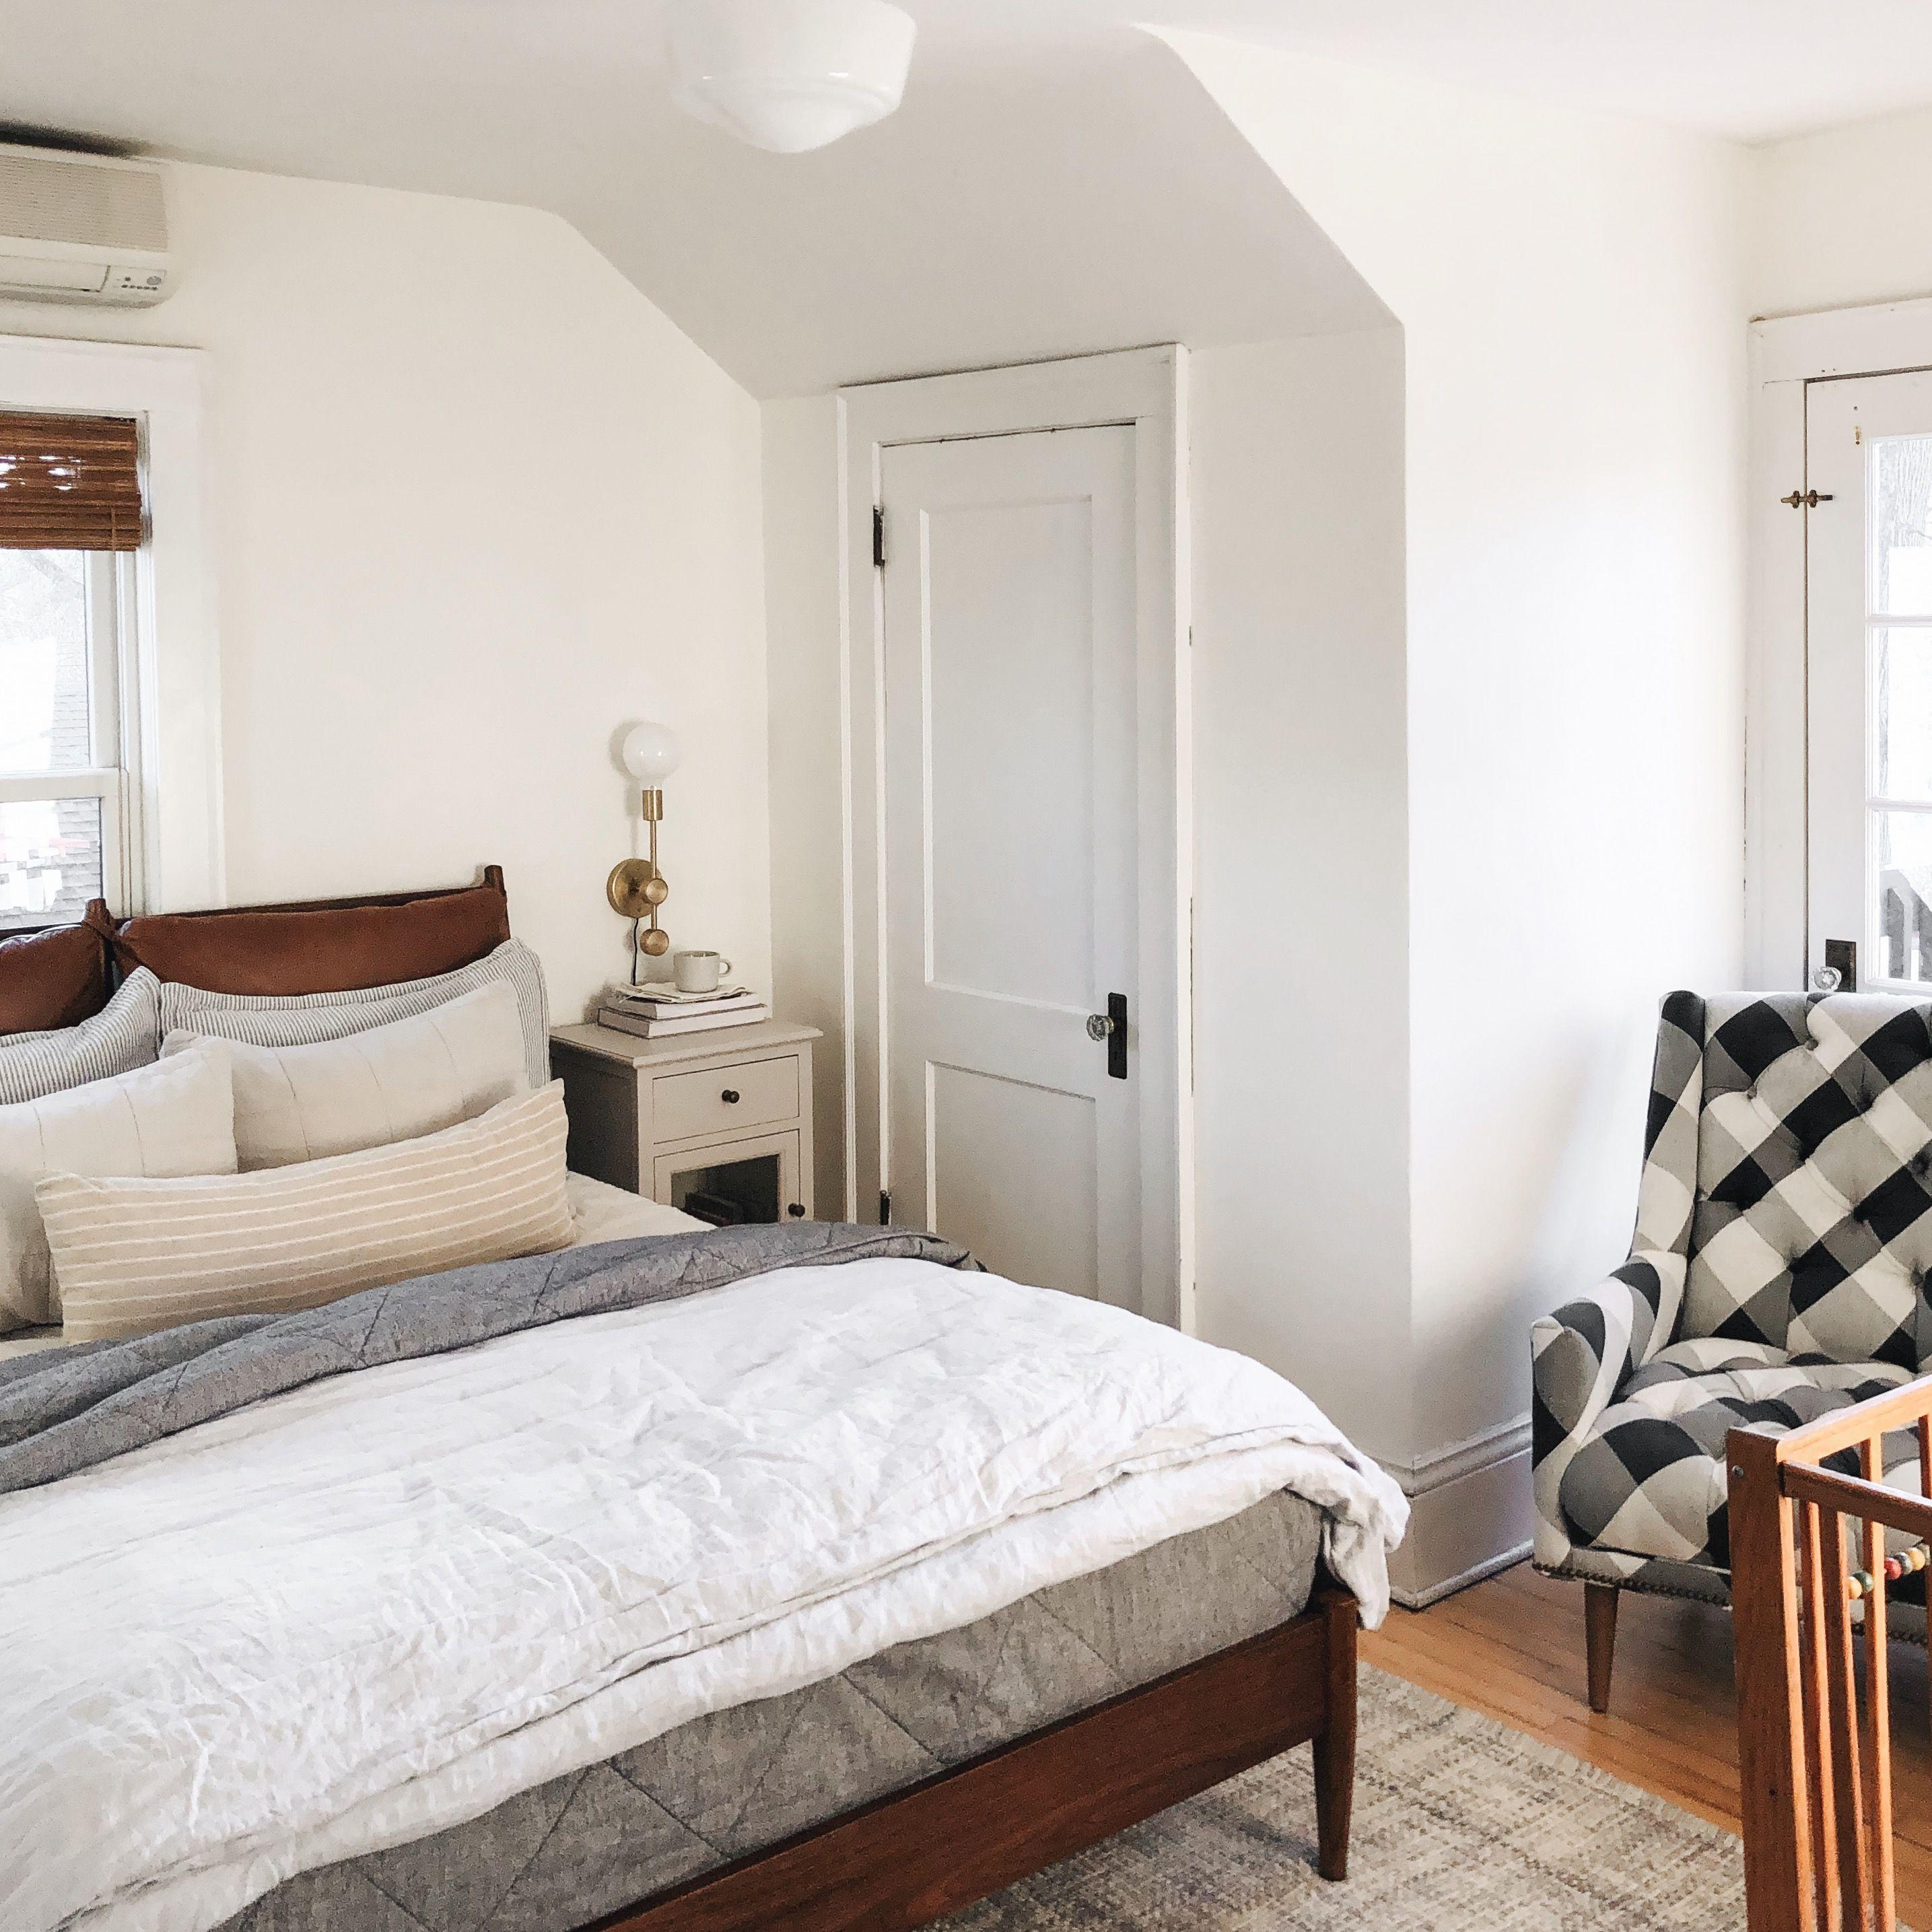 Quilt Bed Linens Luxury Home Grey Linen Bedding